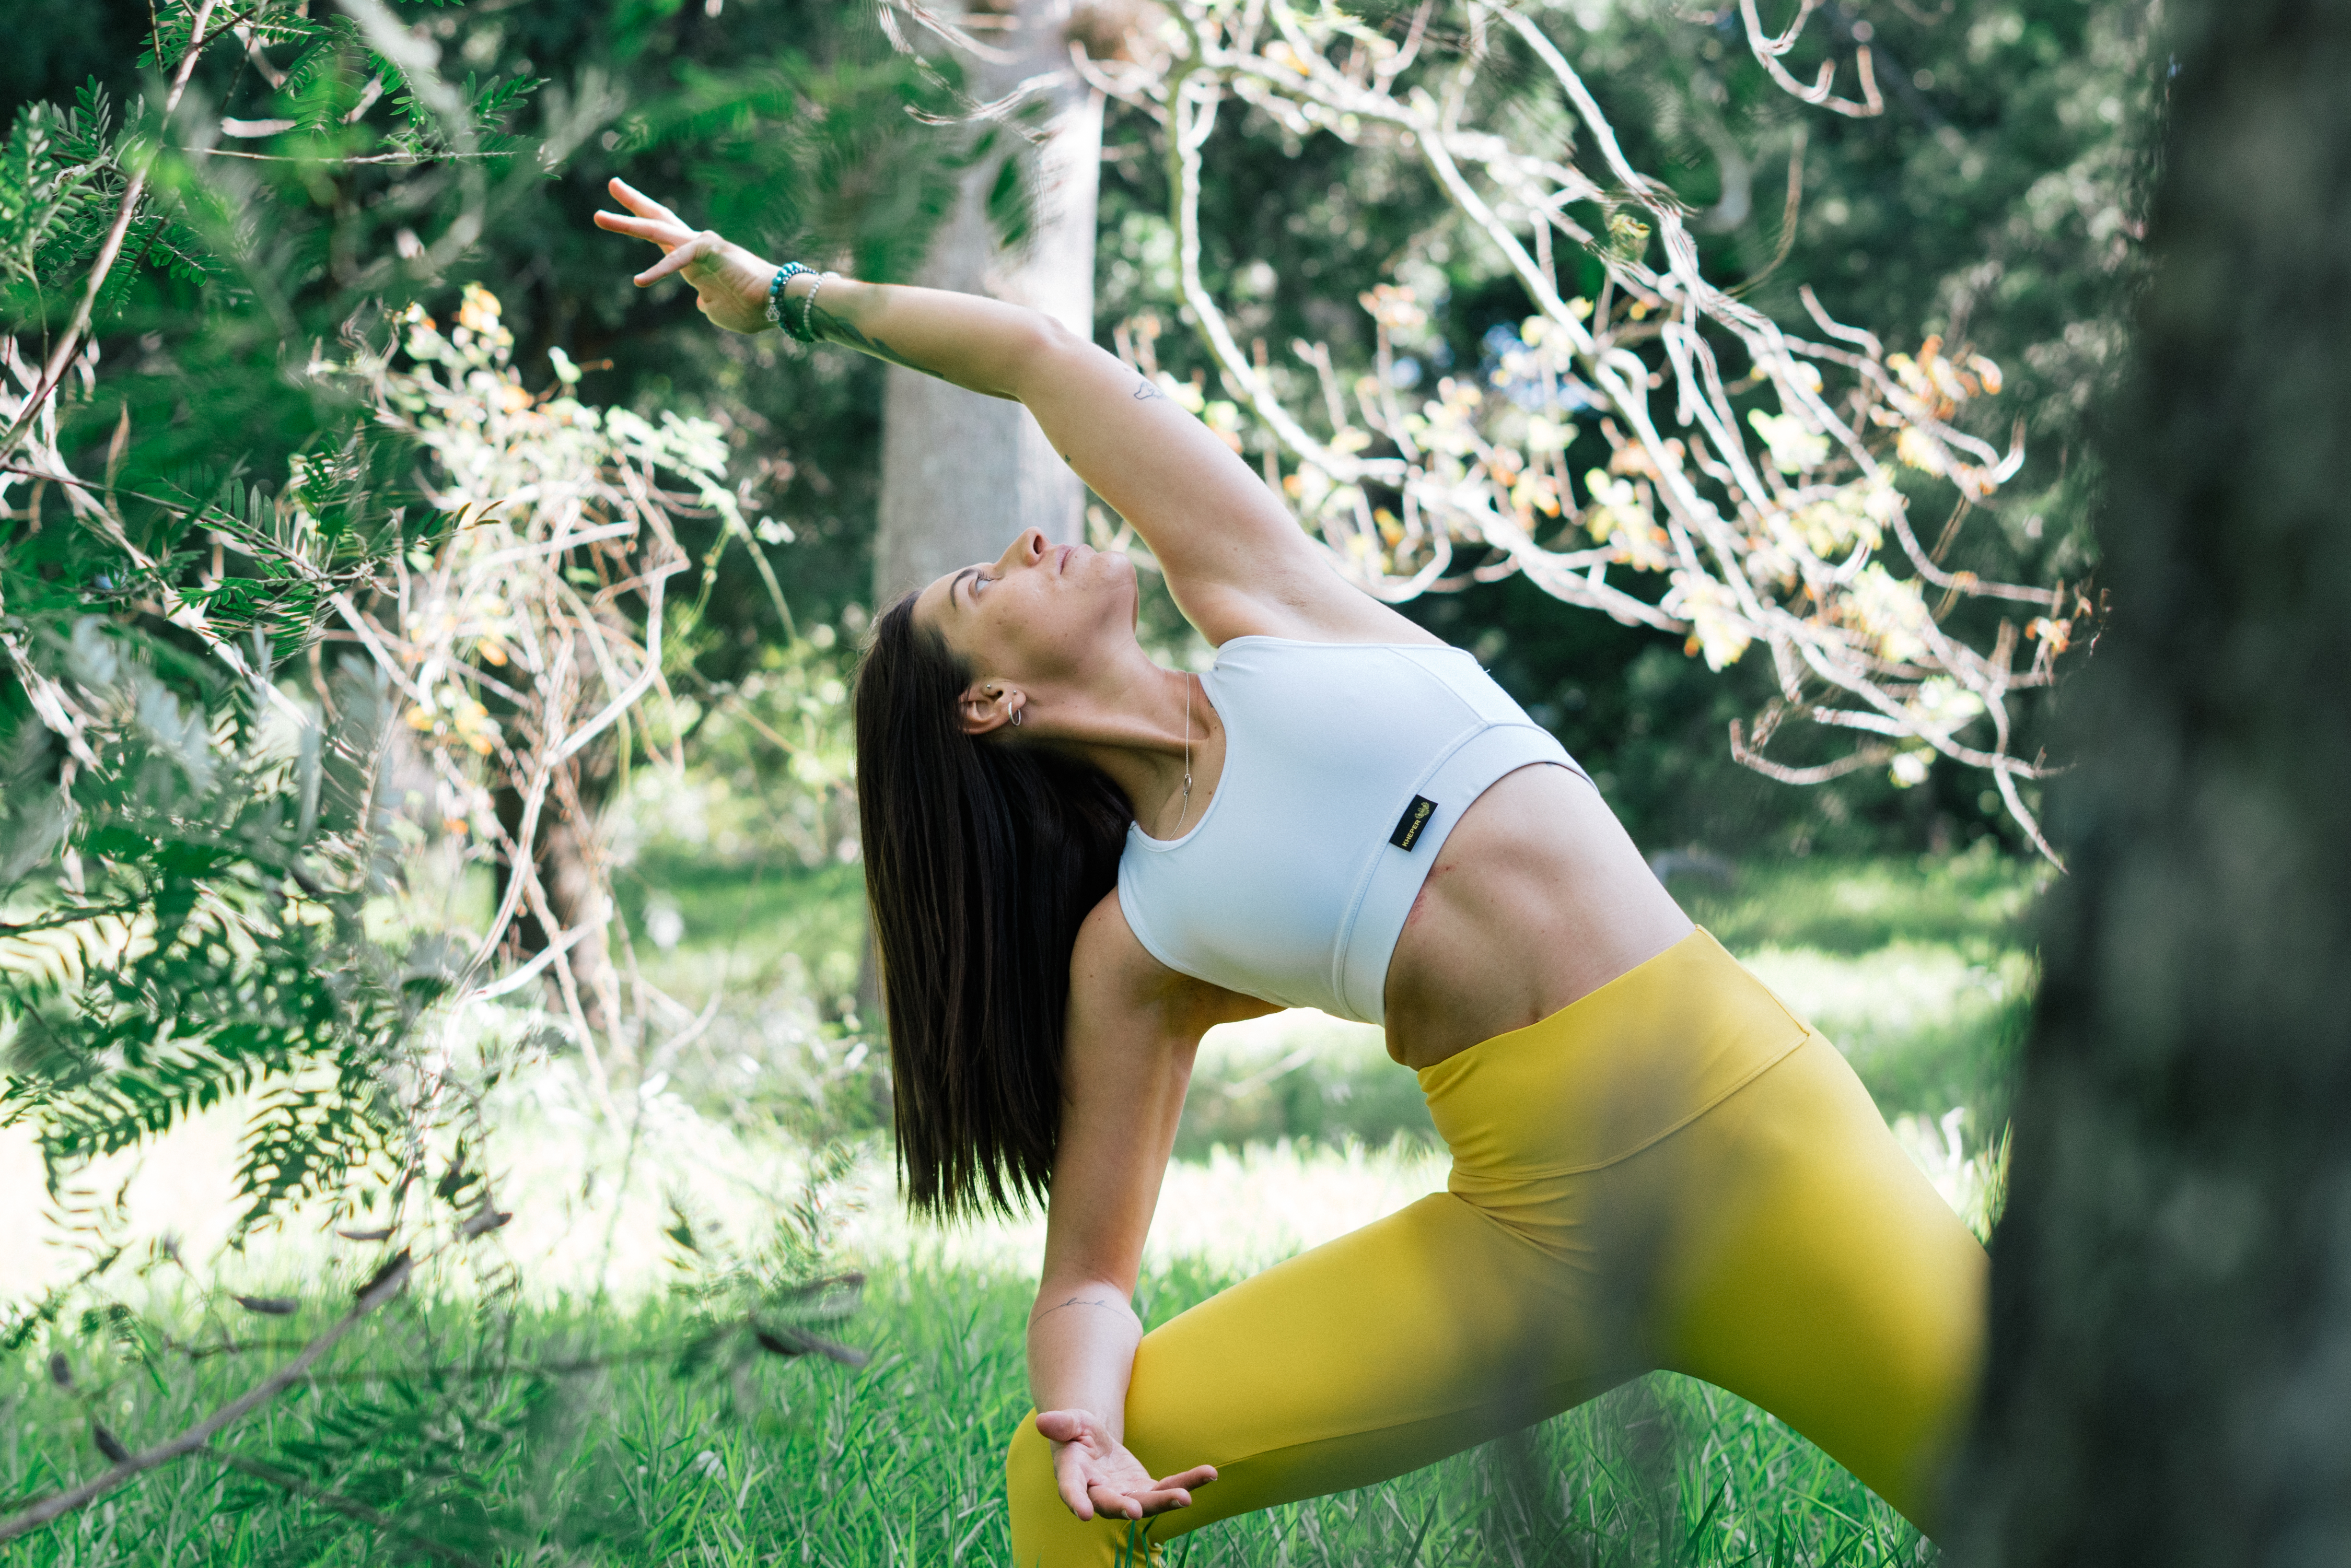 pexels photo 3820393 - Yoga for Modern City Life: Yoga Helps Ease Modern Stress